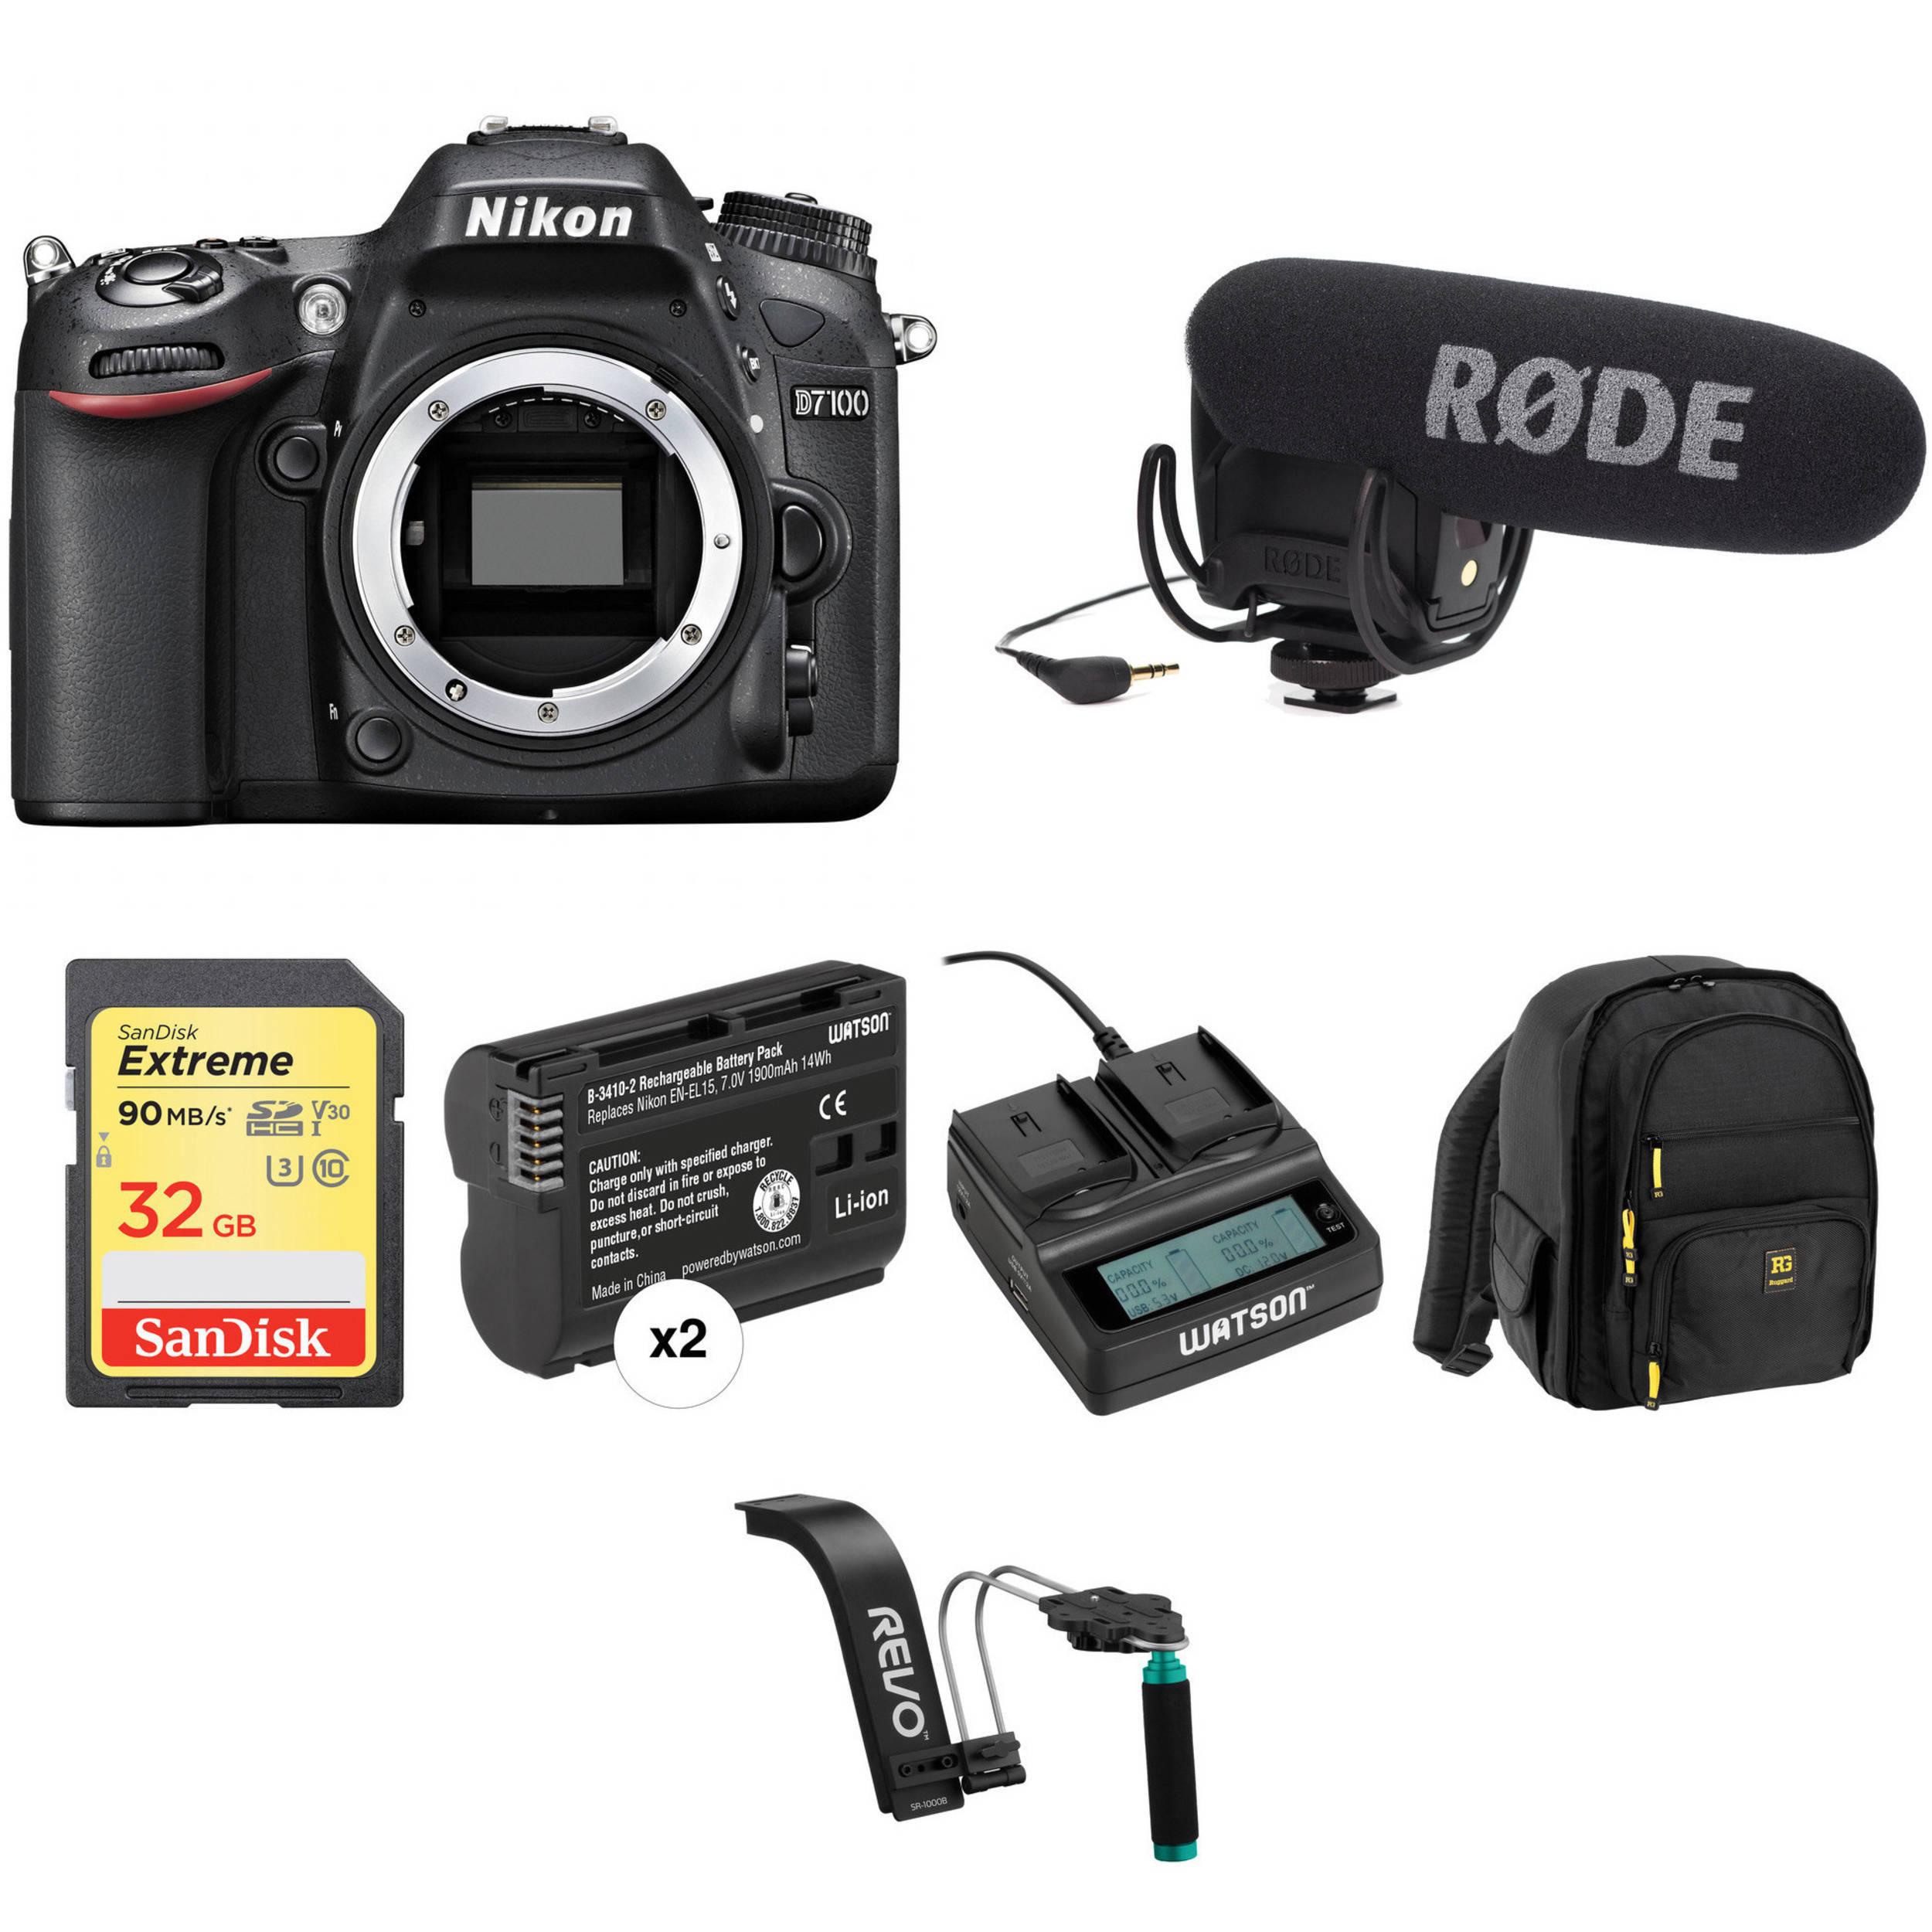 Nikon D7100 DSLR Camera (Body Only) Video Production Kit B&H